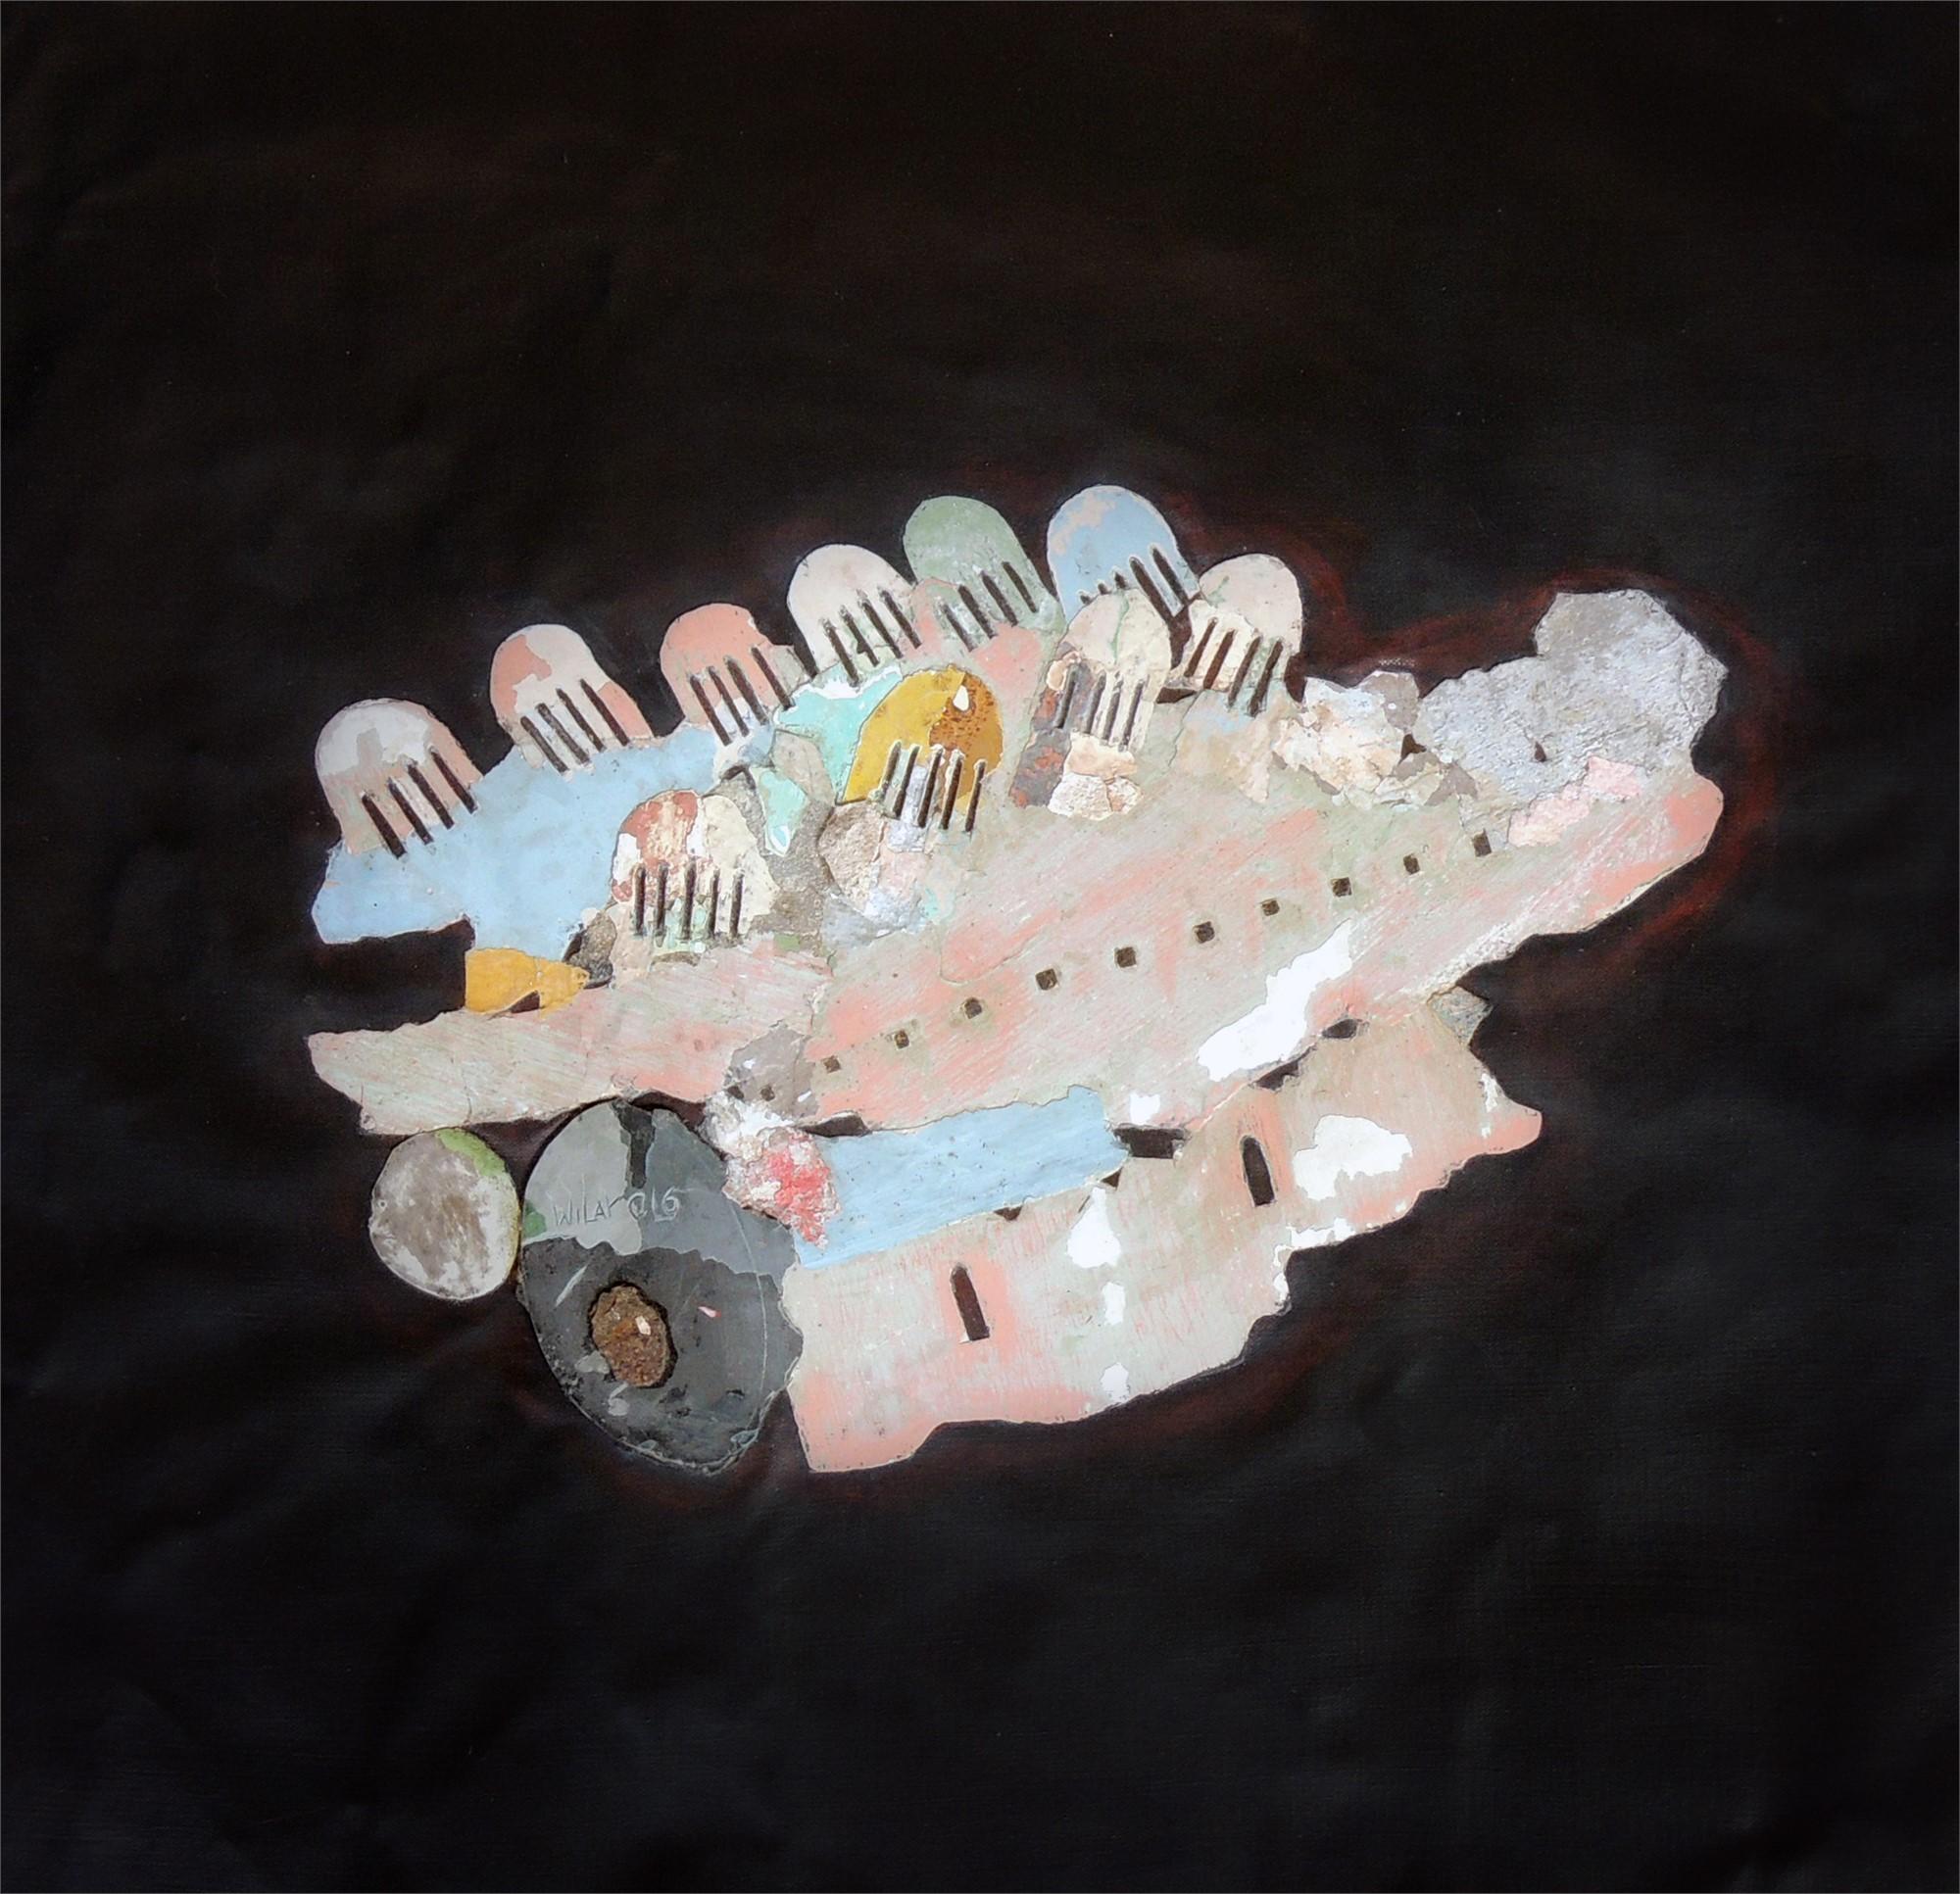 Plane (Transbordador) (M-14) by Wilay Mendez